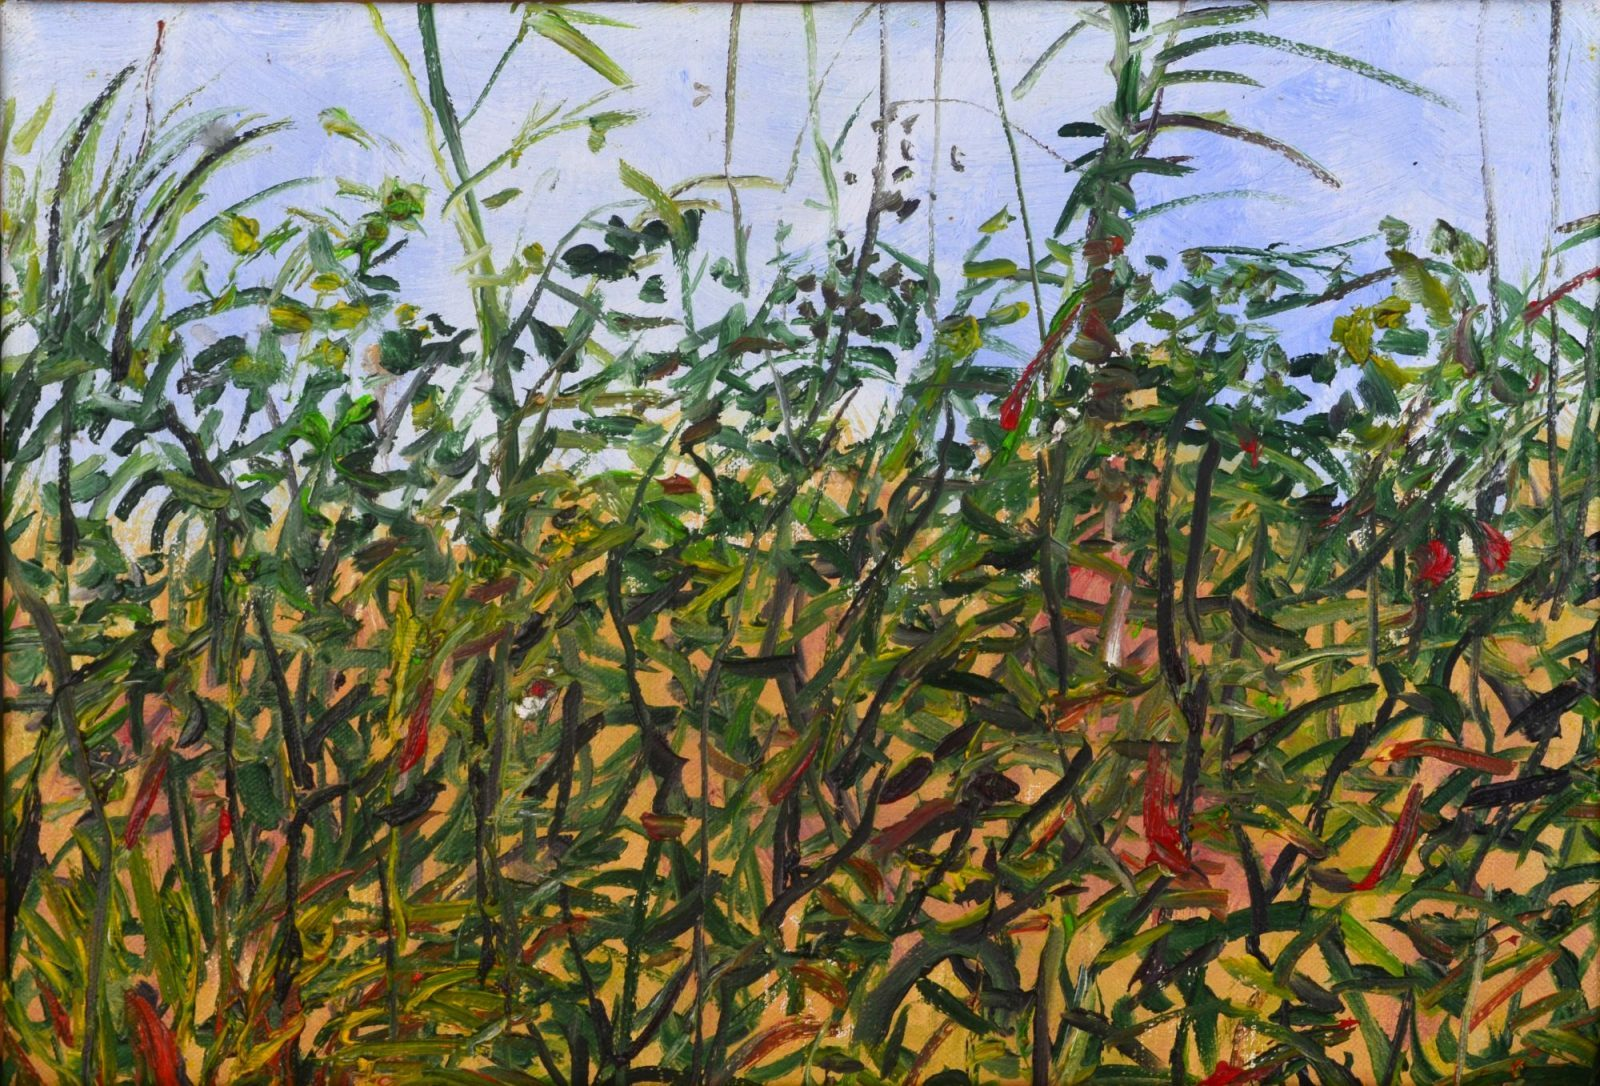 franyo aatoth: Garden Series 8.